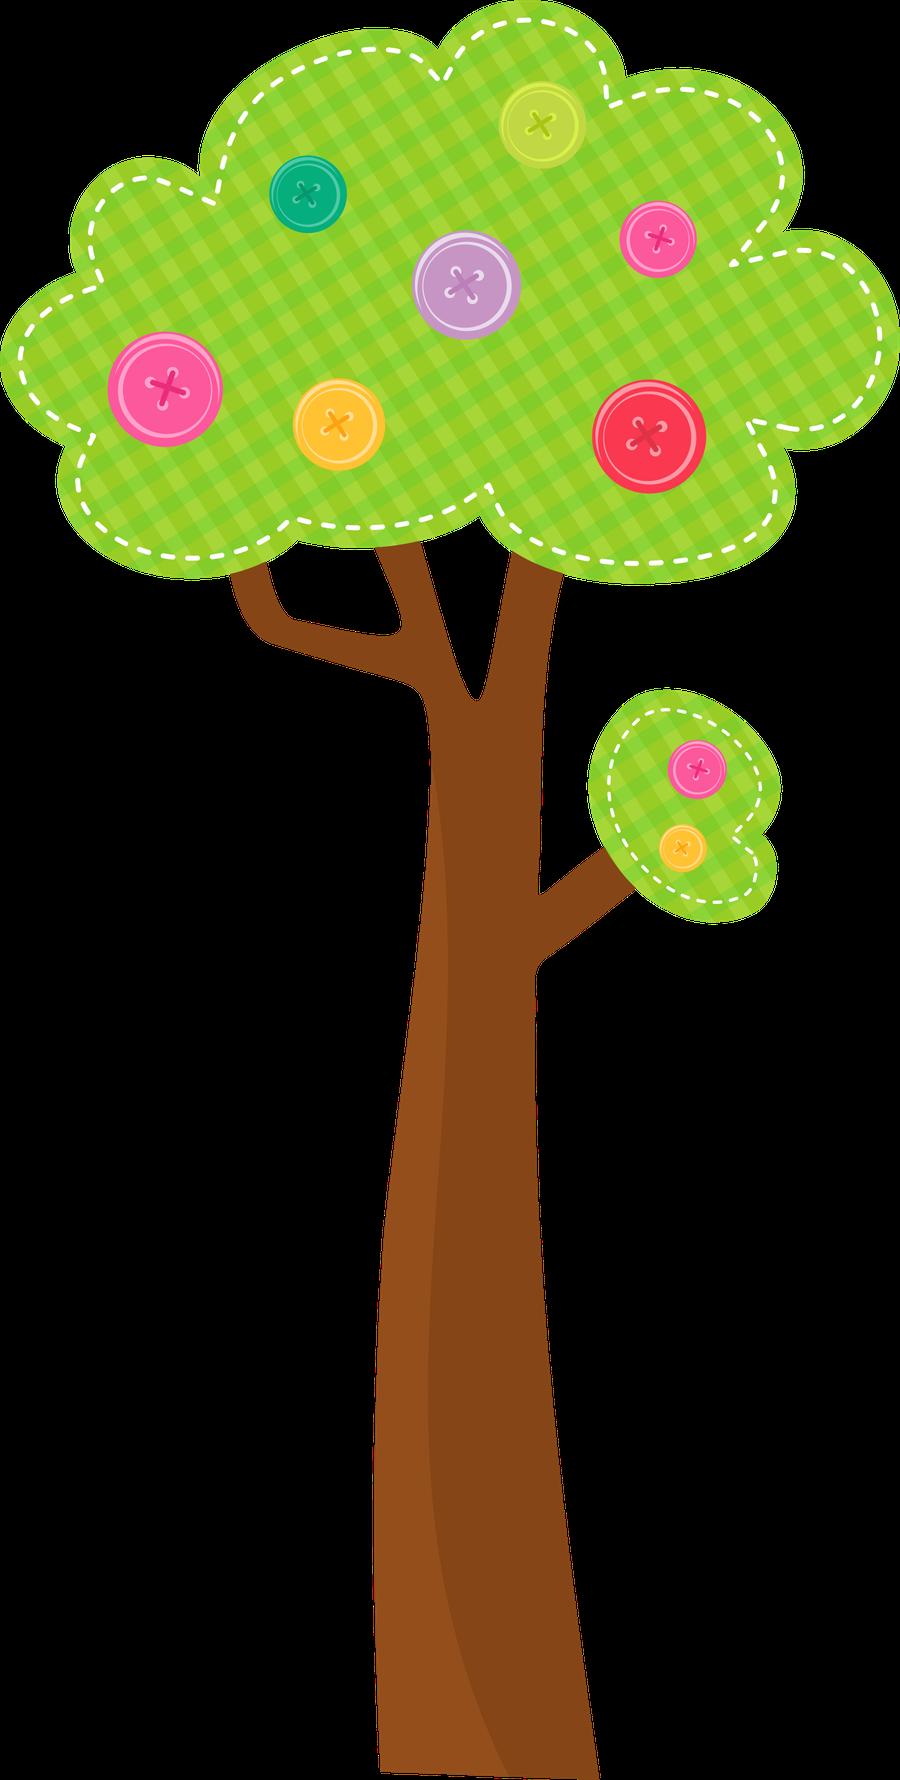 trees sticker pics. Hug clipart tree